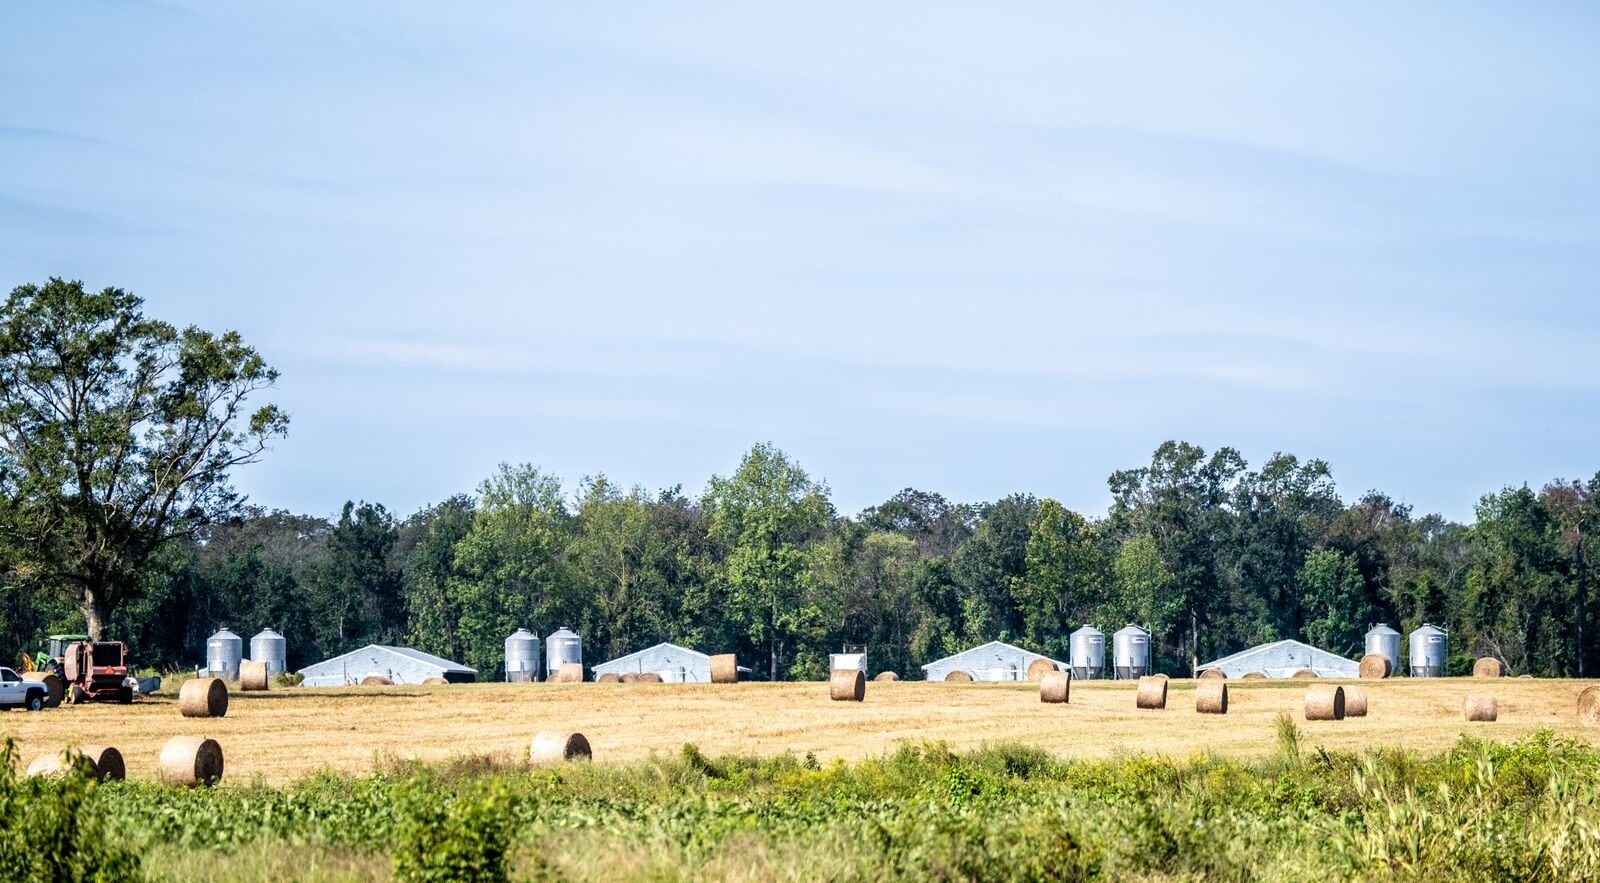 Pig farm in North Carolina